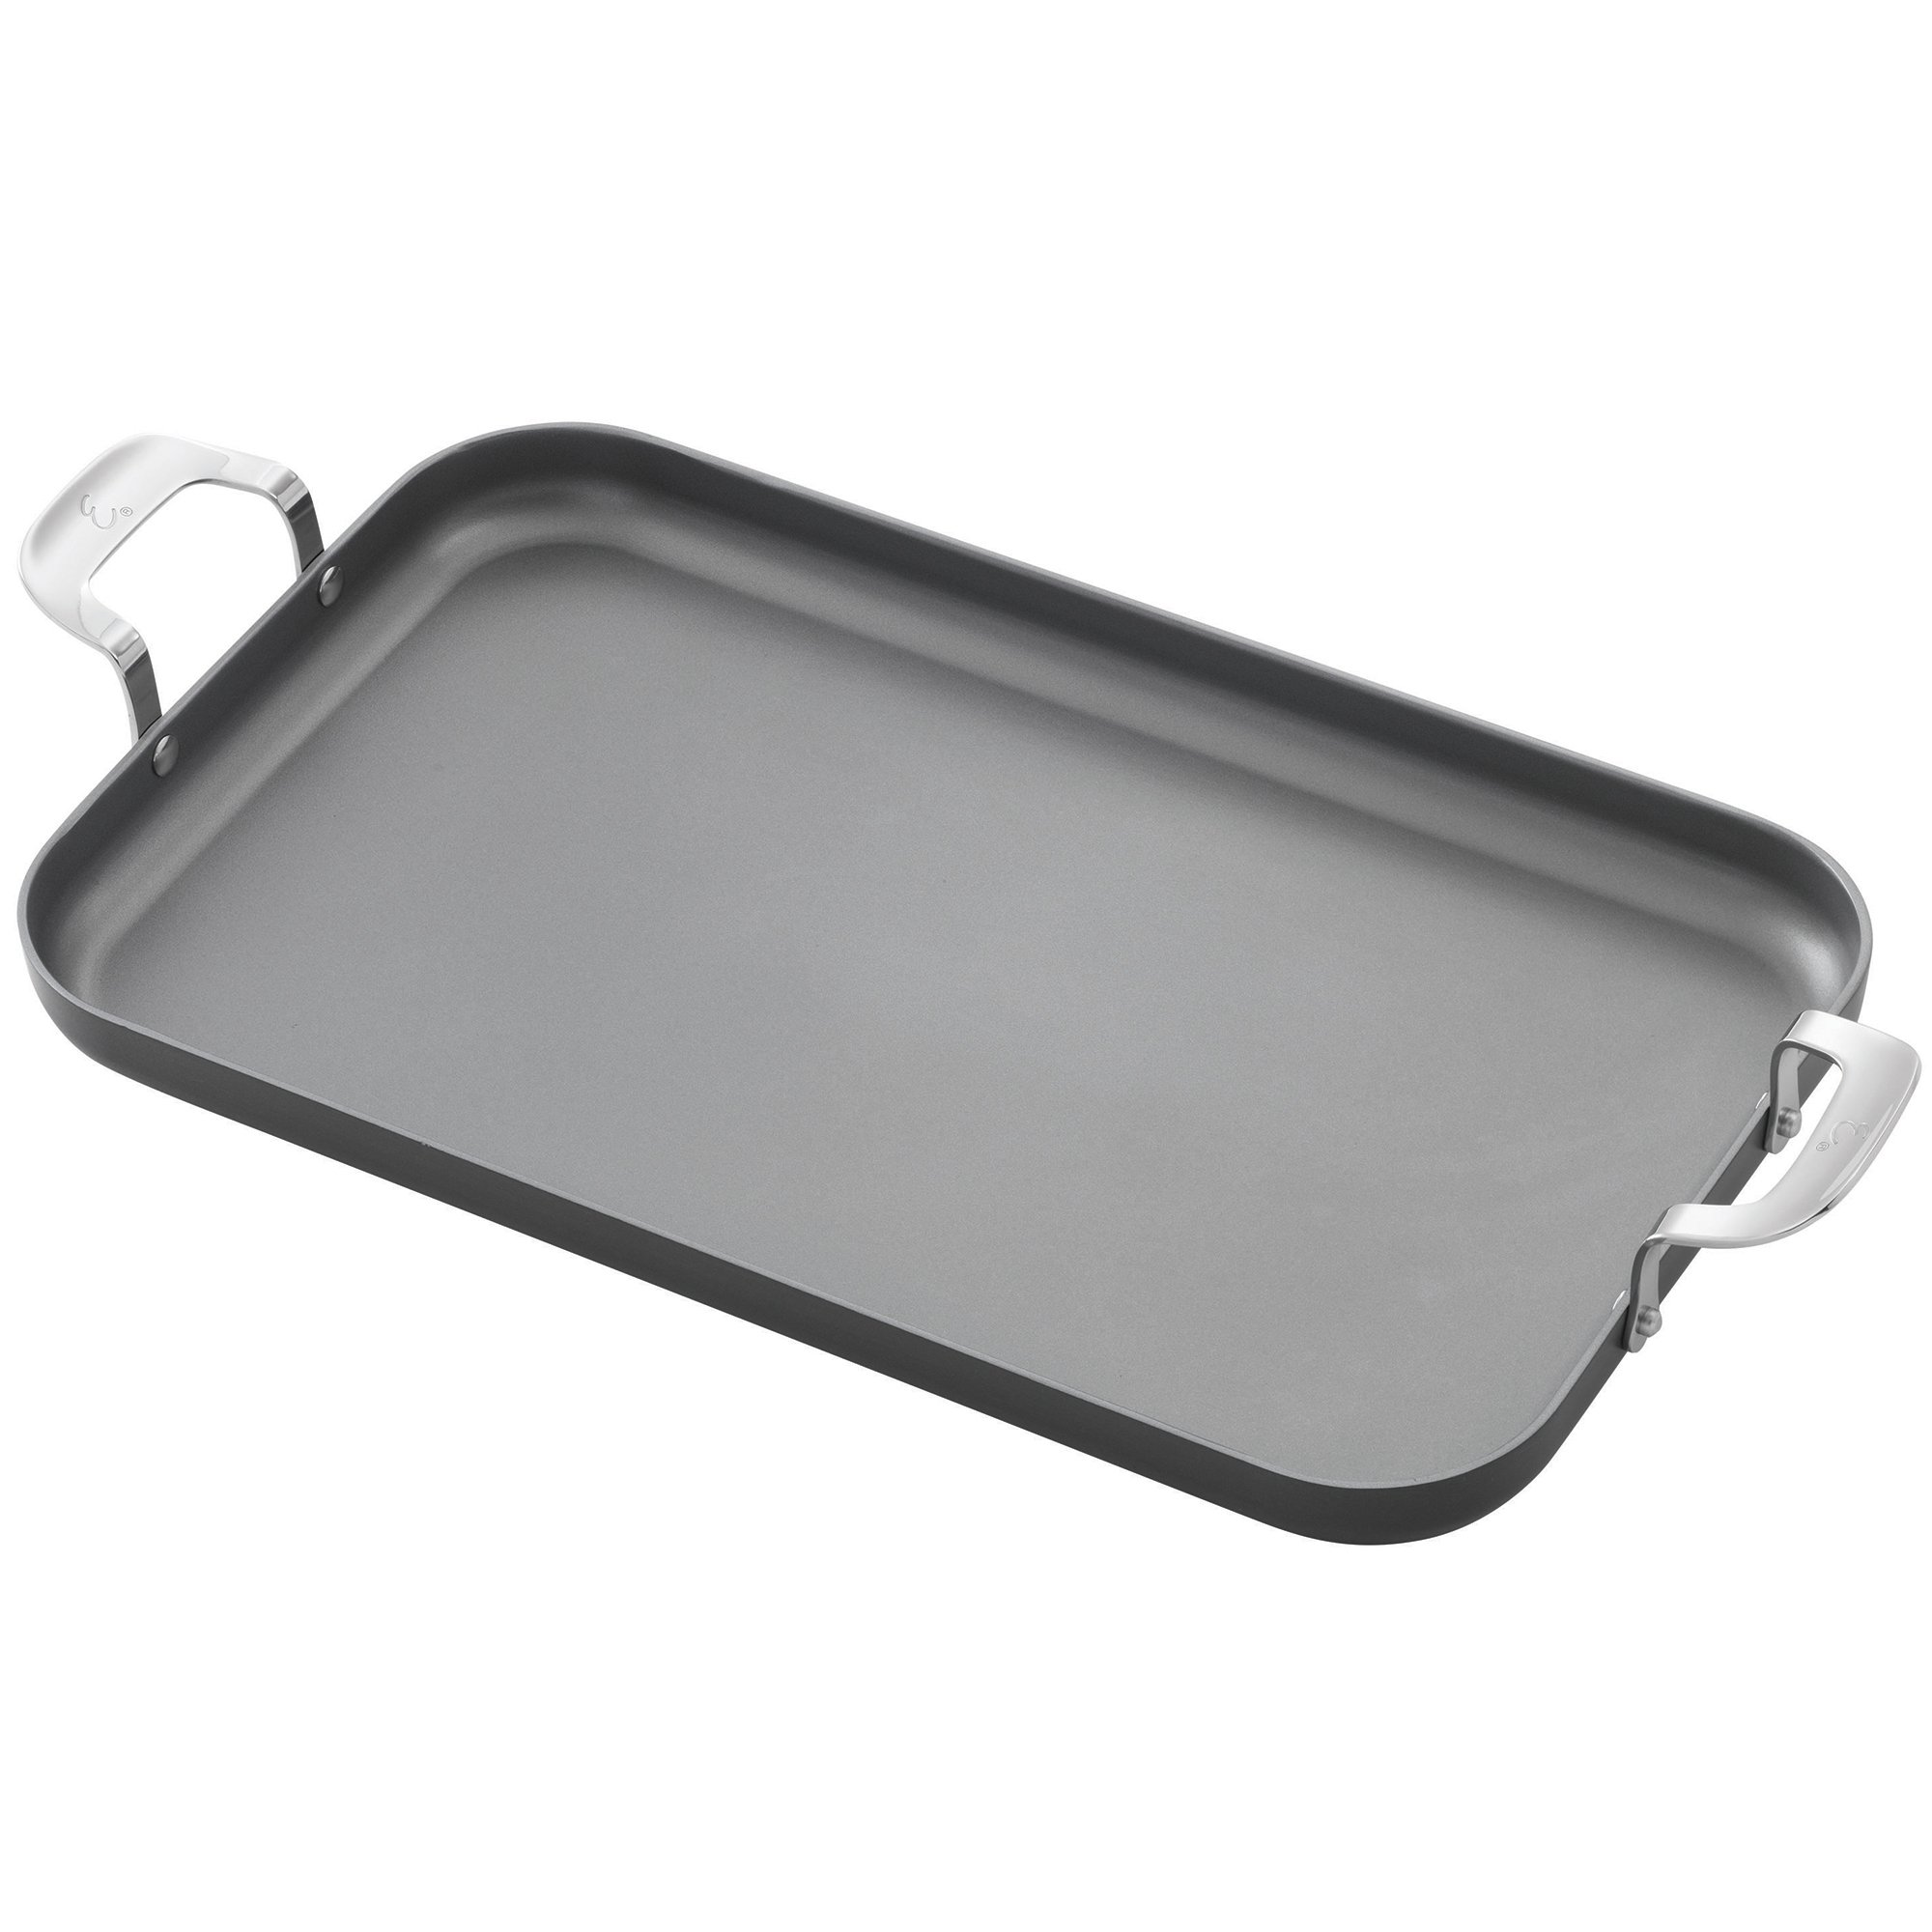 Emeril Lagasse 62929 Dishwasher safe Nonstick Hard Anodized Double Burner Griddle, 11''x18'',Gray